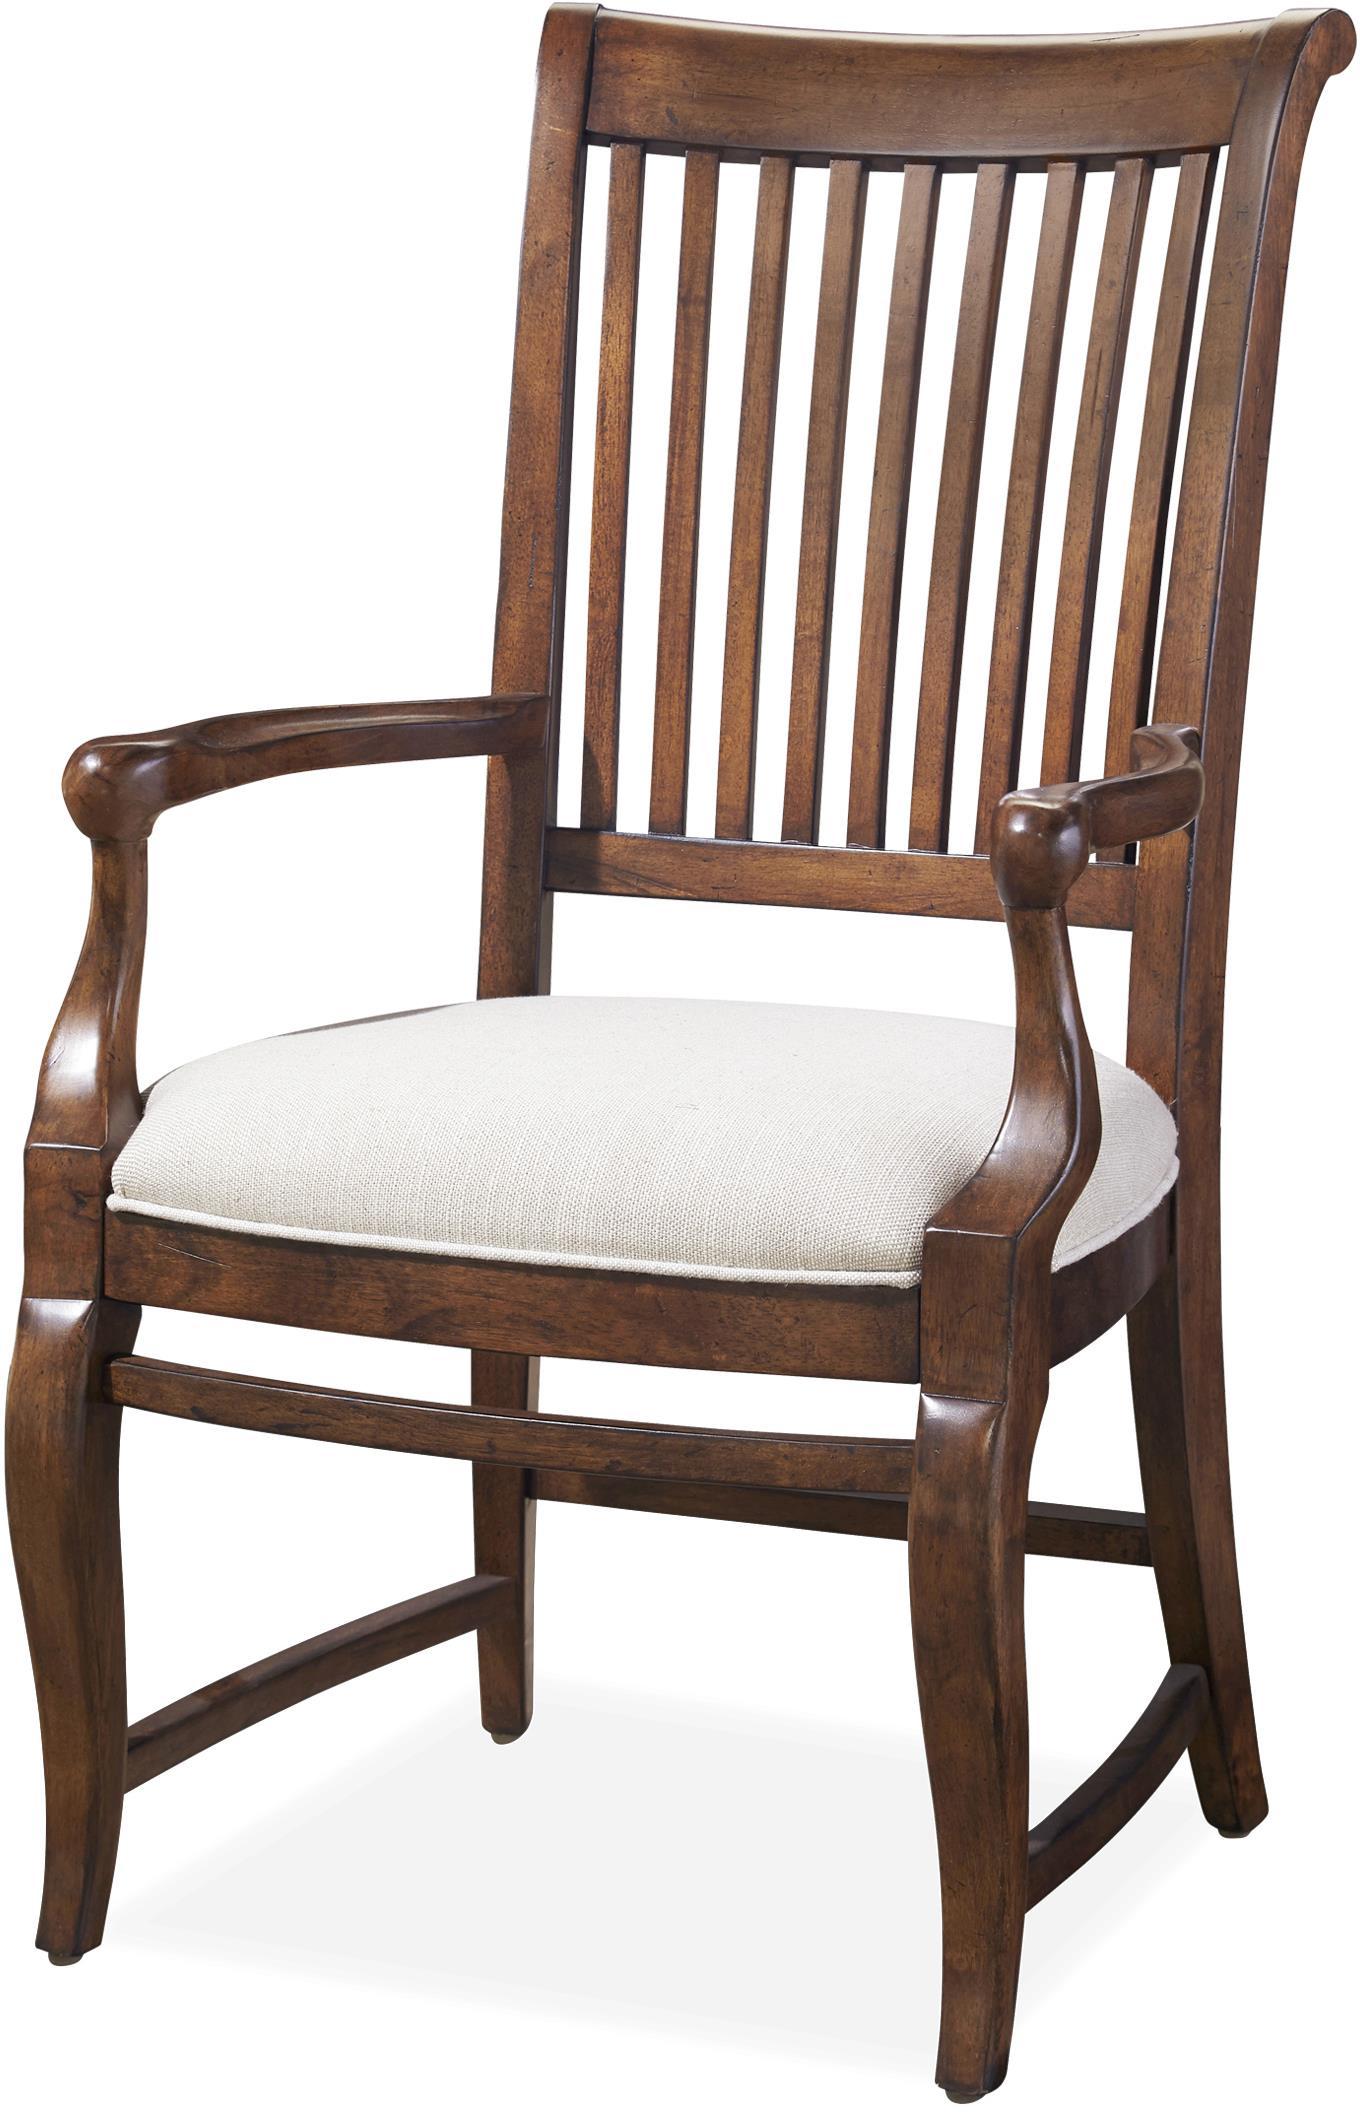 paula deen dogwood dining chairs hanging pod australia darling arm chair with slat back